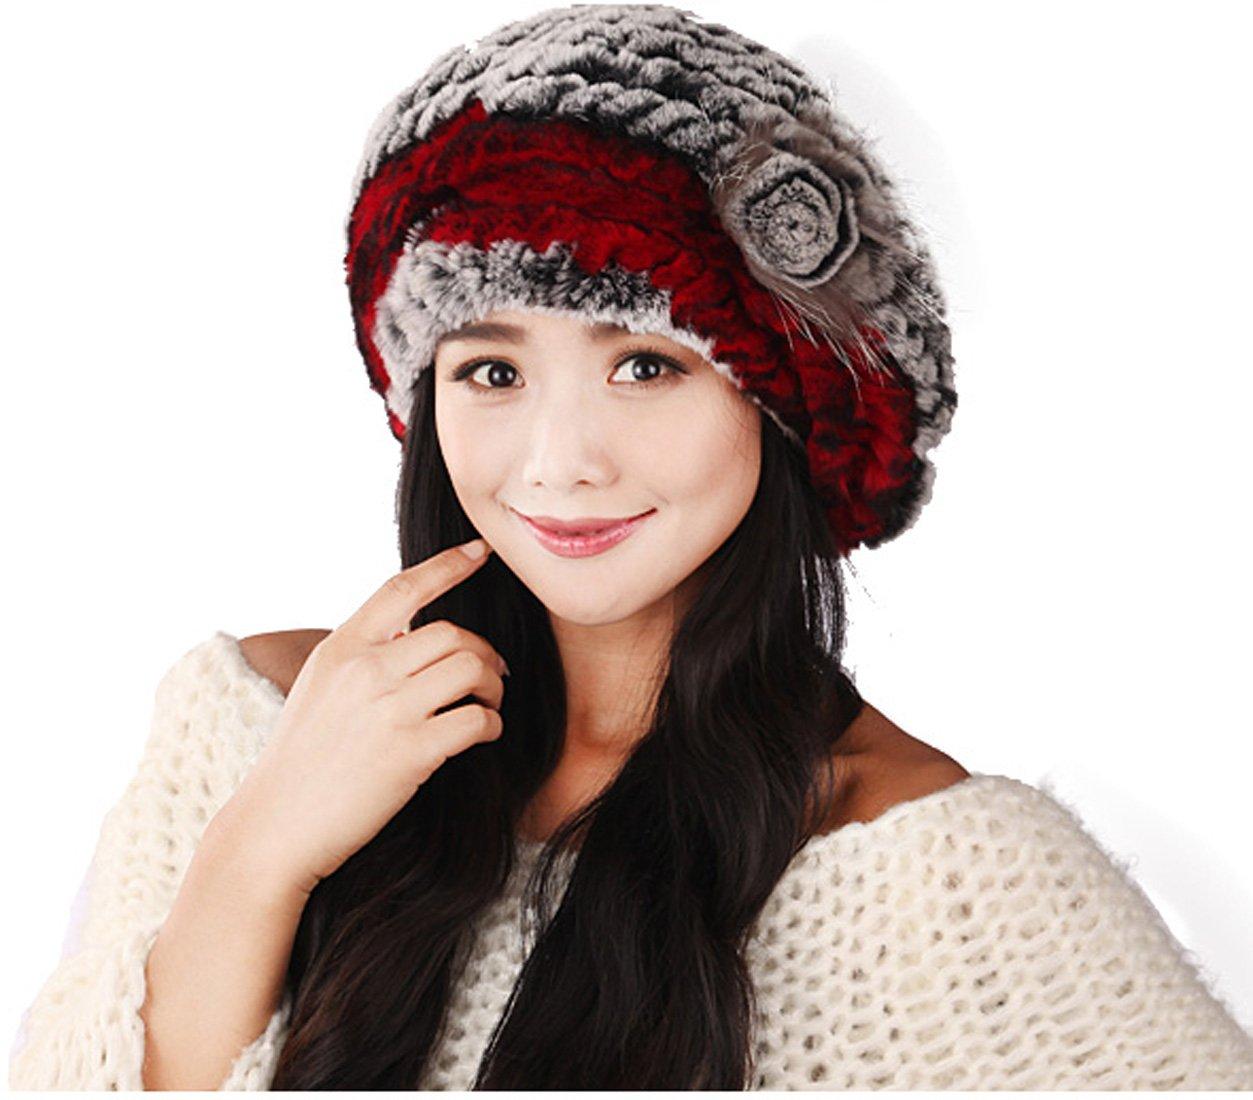 URSFUR Winter Women's Rex Rabbit Fur Beret Hats with Fur Flower (Grey & Red) by URSFUR (Image #1)